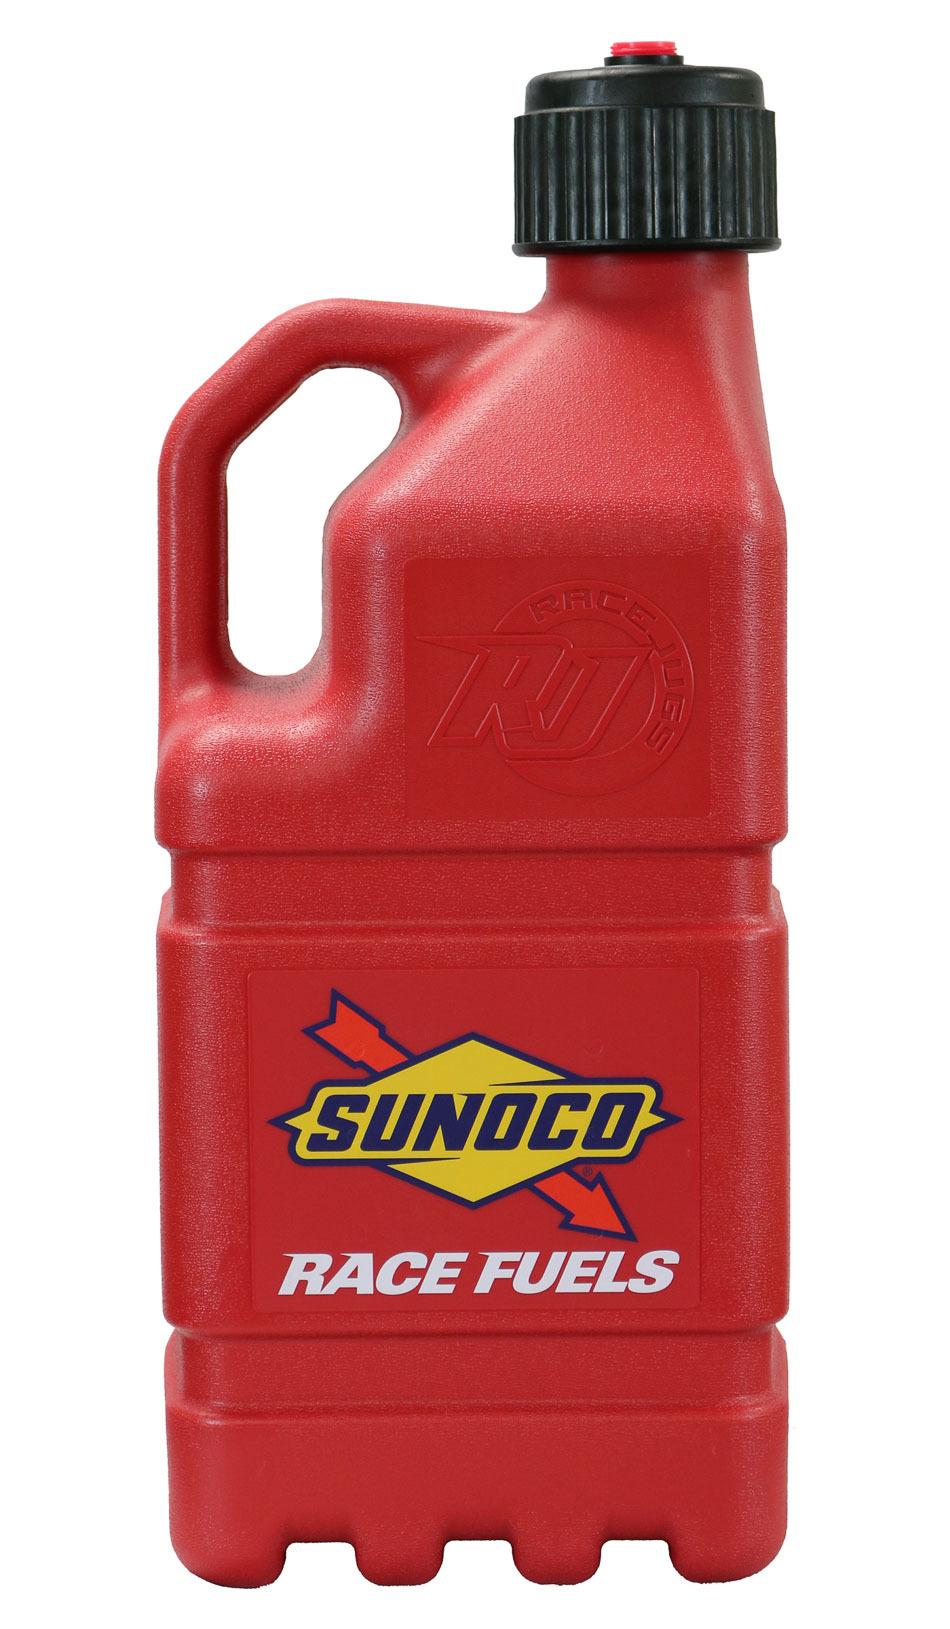 Sunoco Race Jugs Red Sunoco Race Jug Gen 2 No Vent